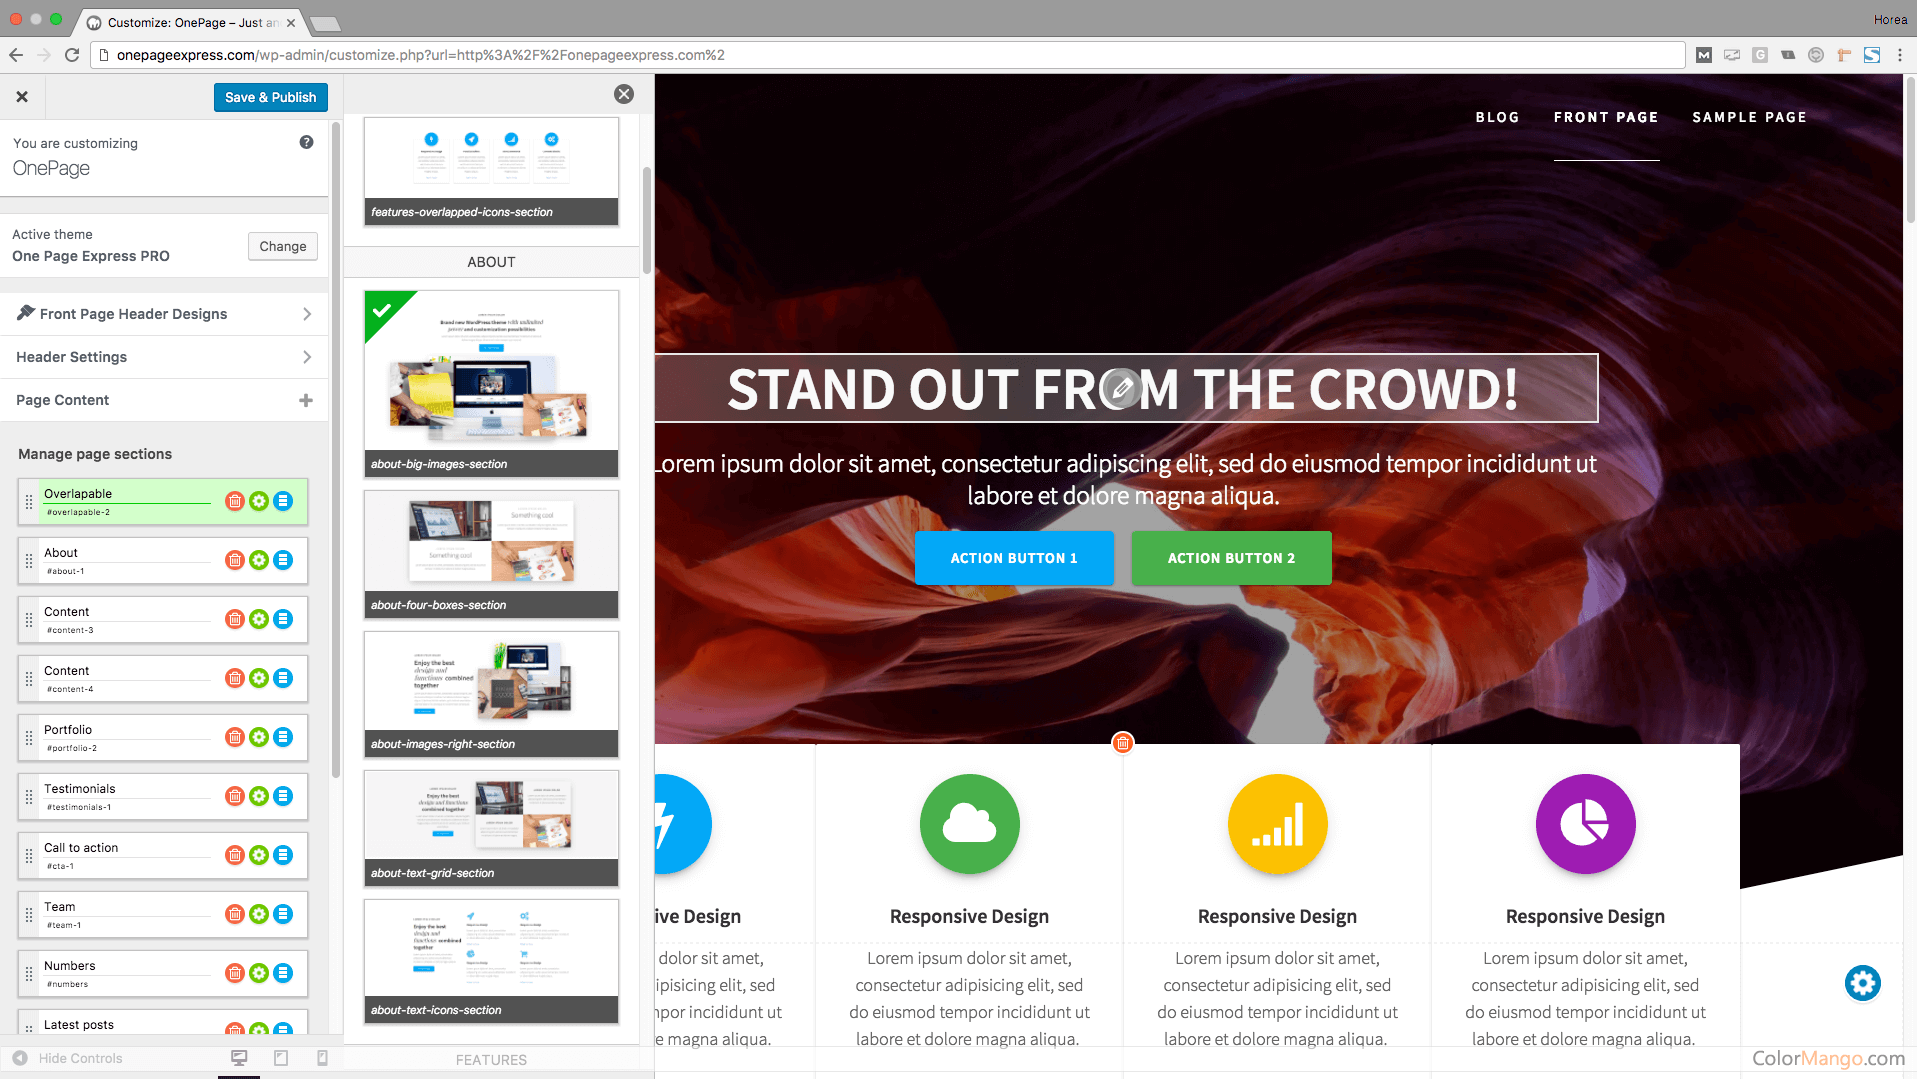 One Page Express PRO Screenshot